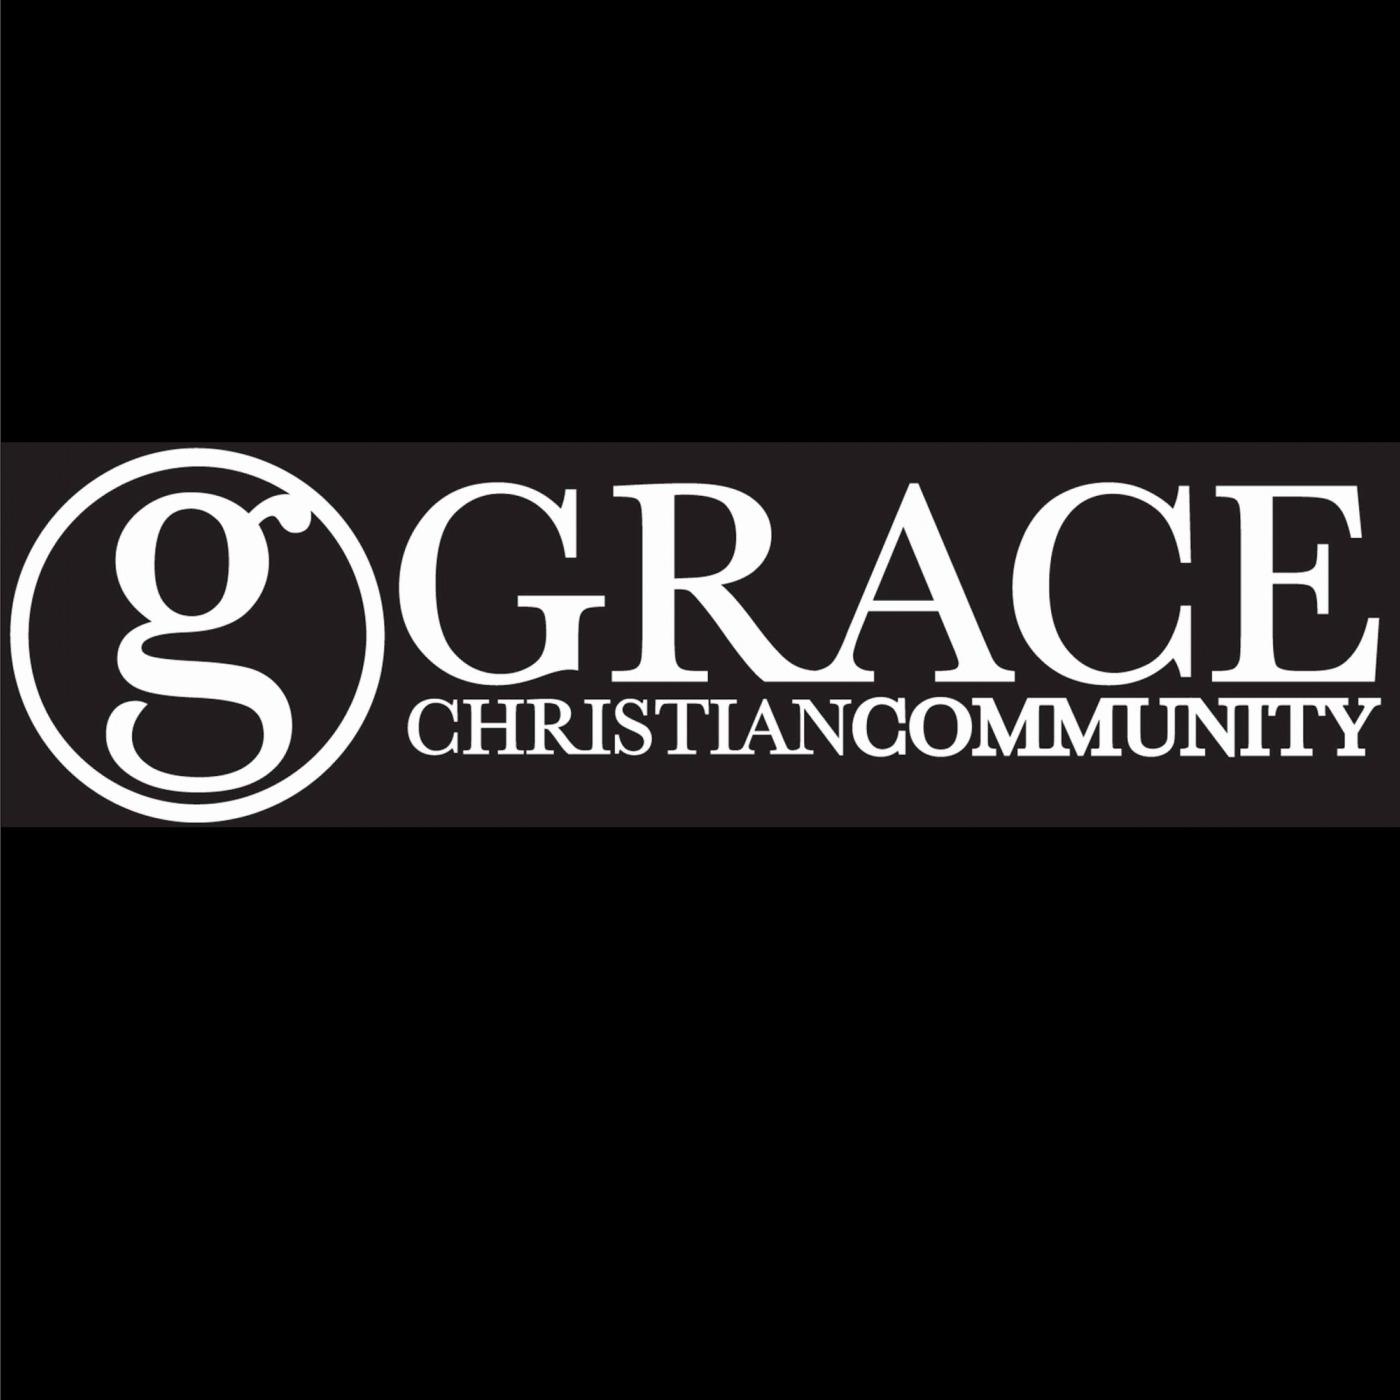 Grace Christian Community